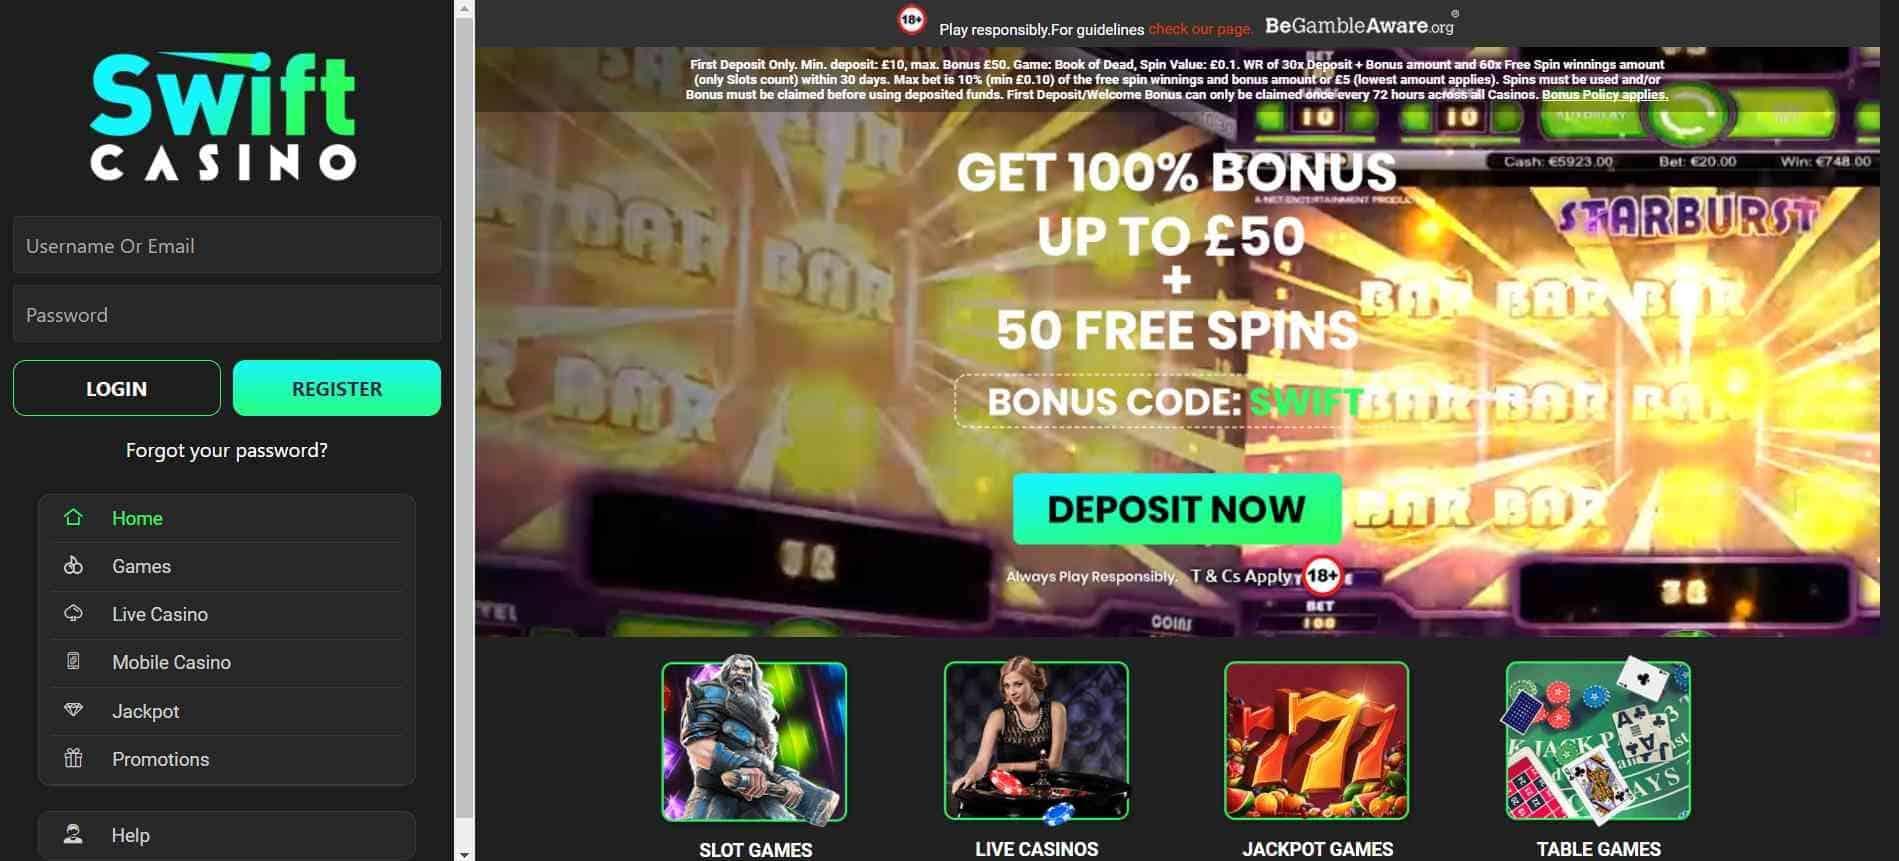 Swift Casino Home Screen